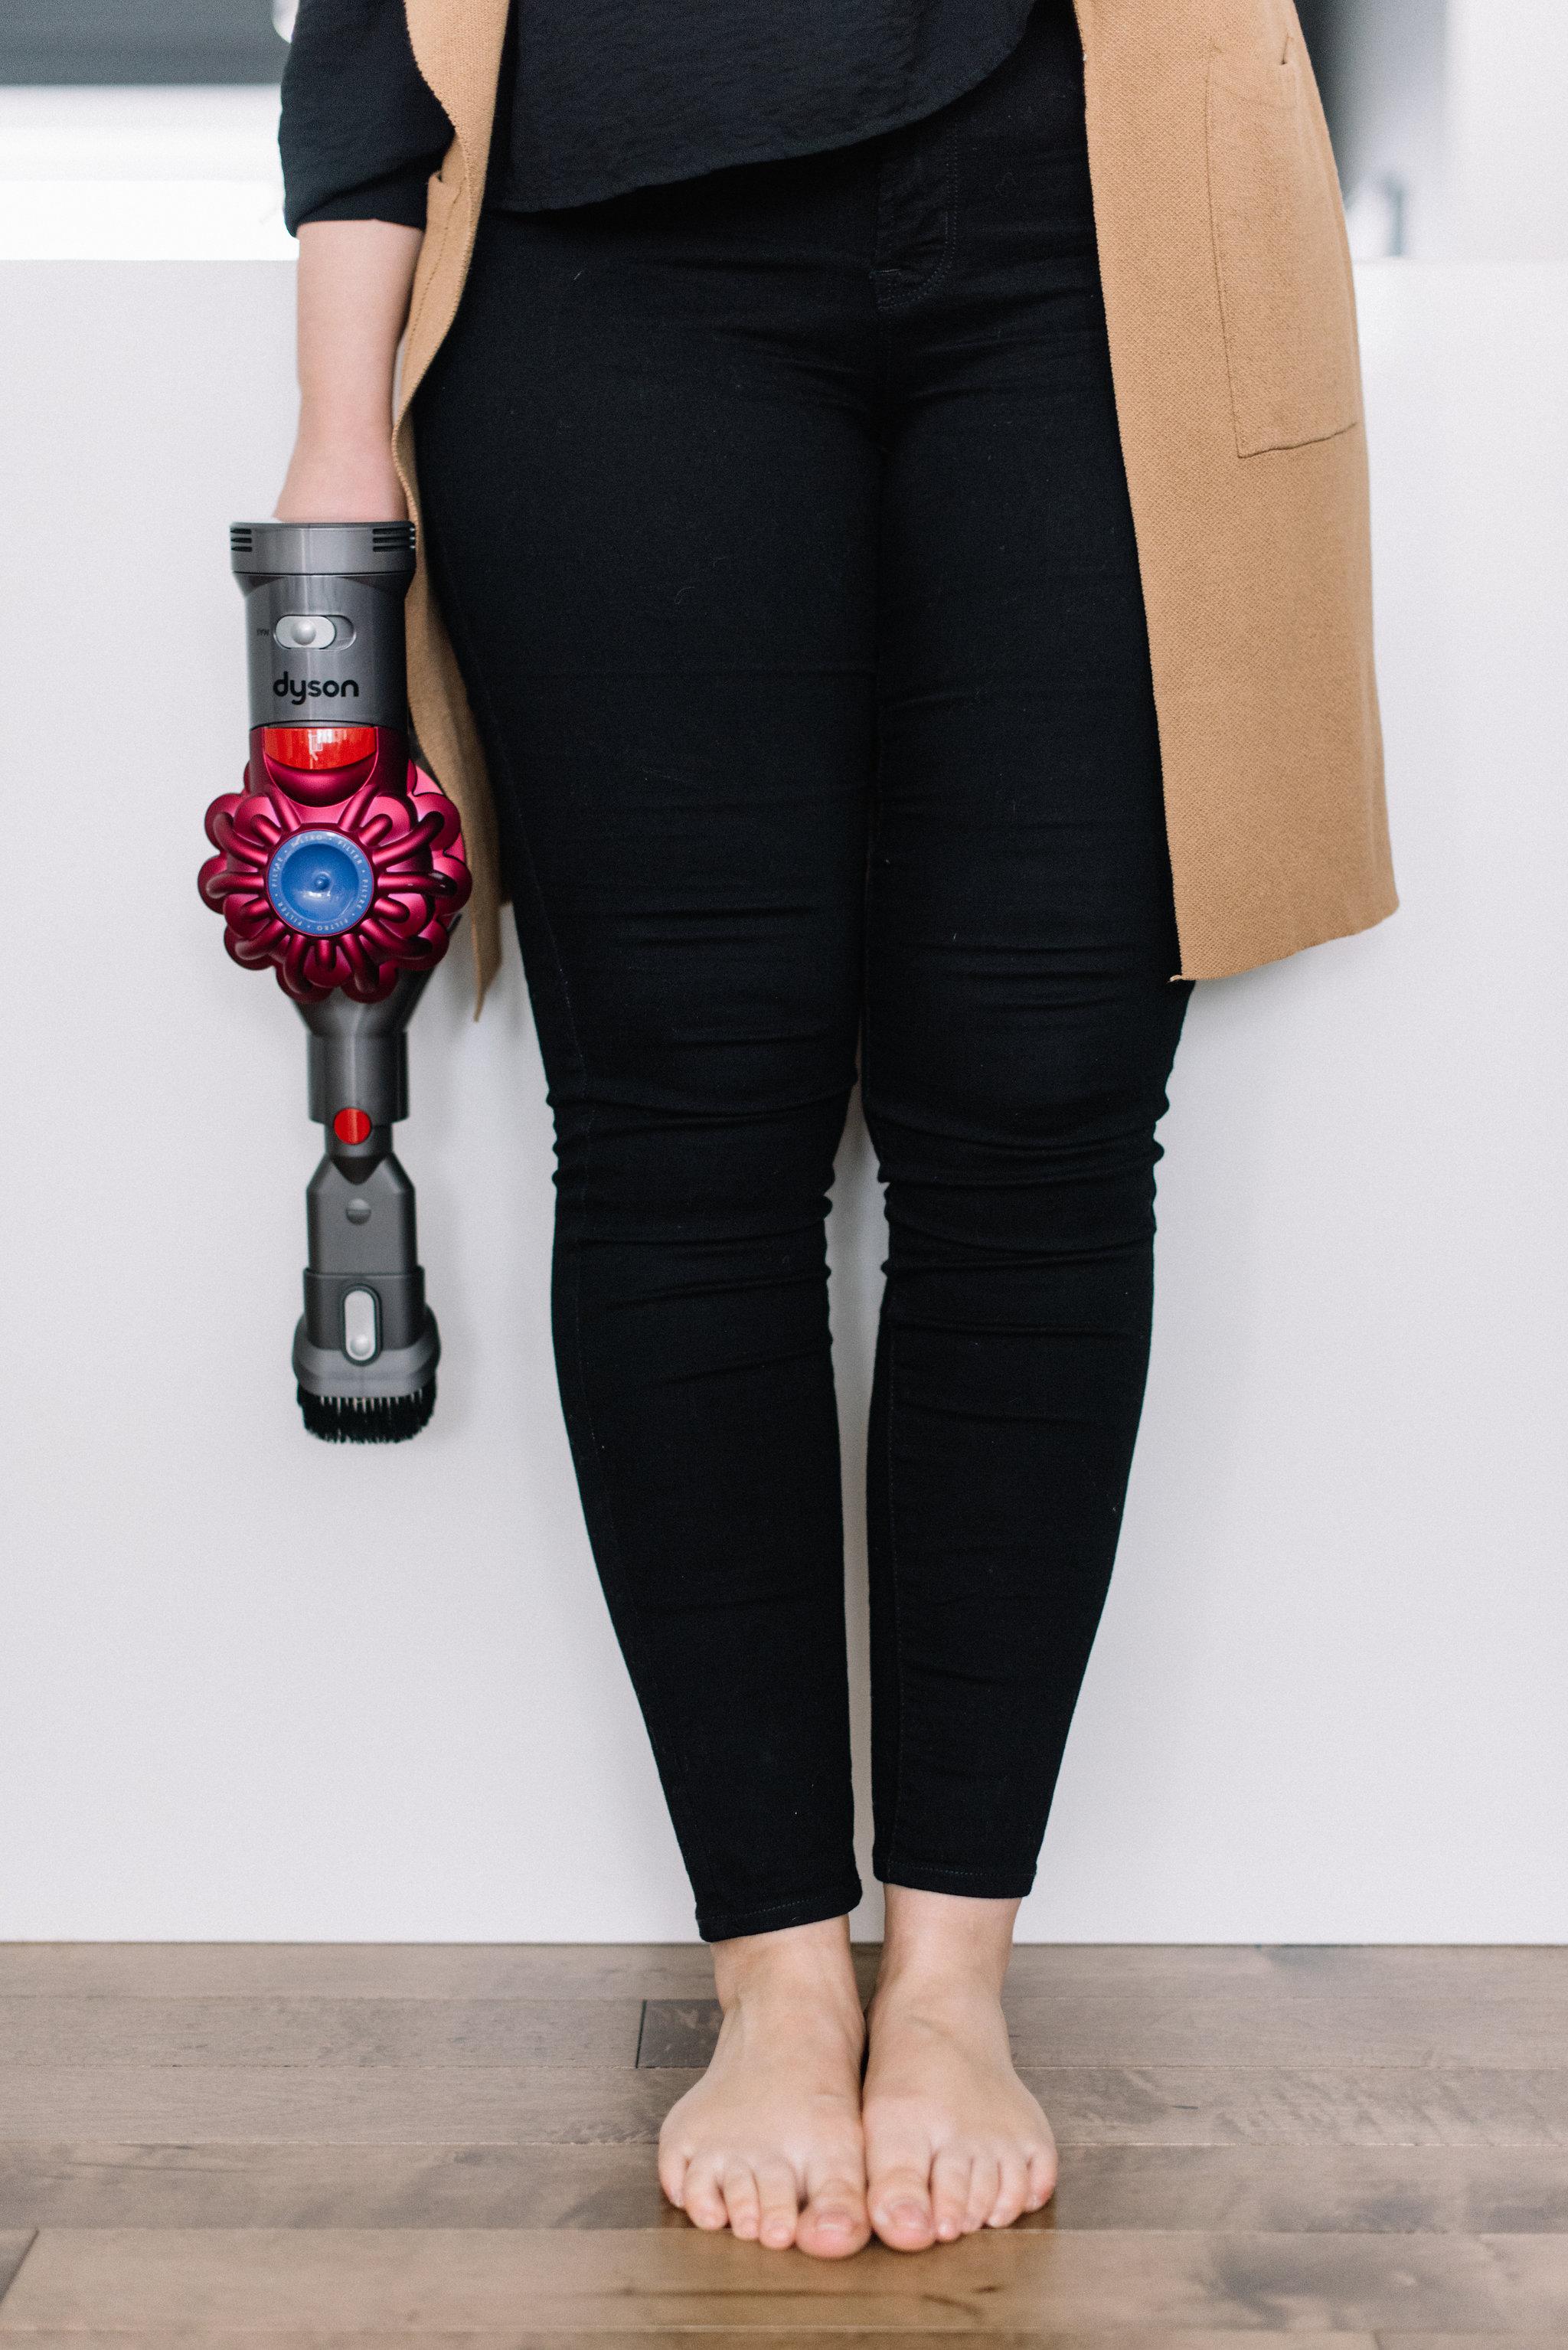 dyson v7 cordless vacuum